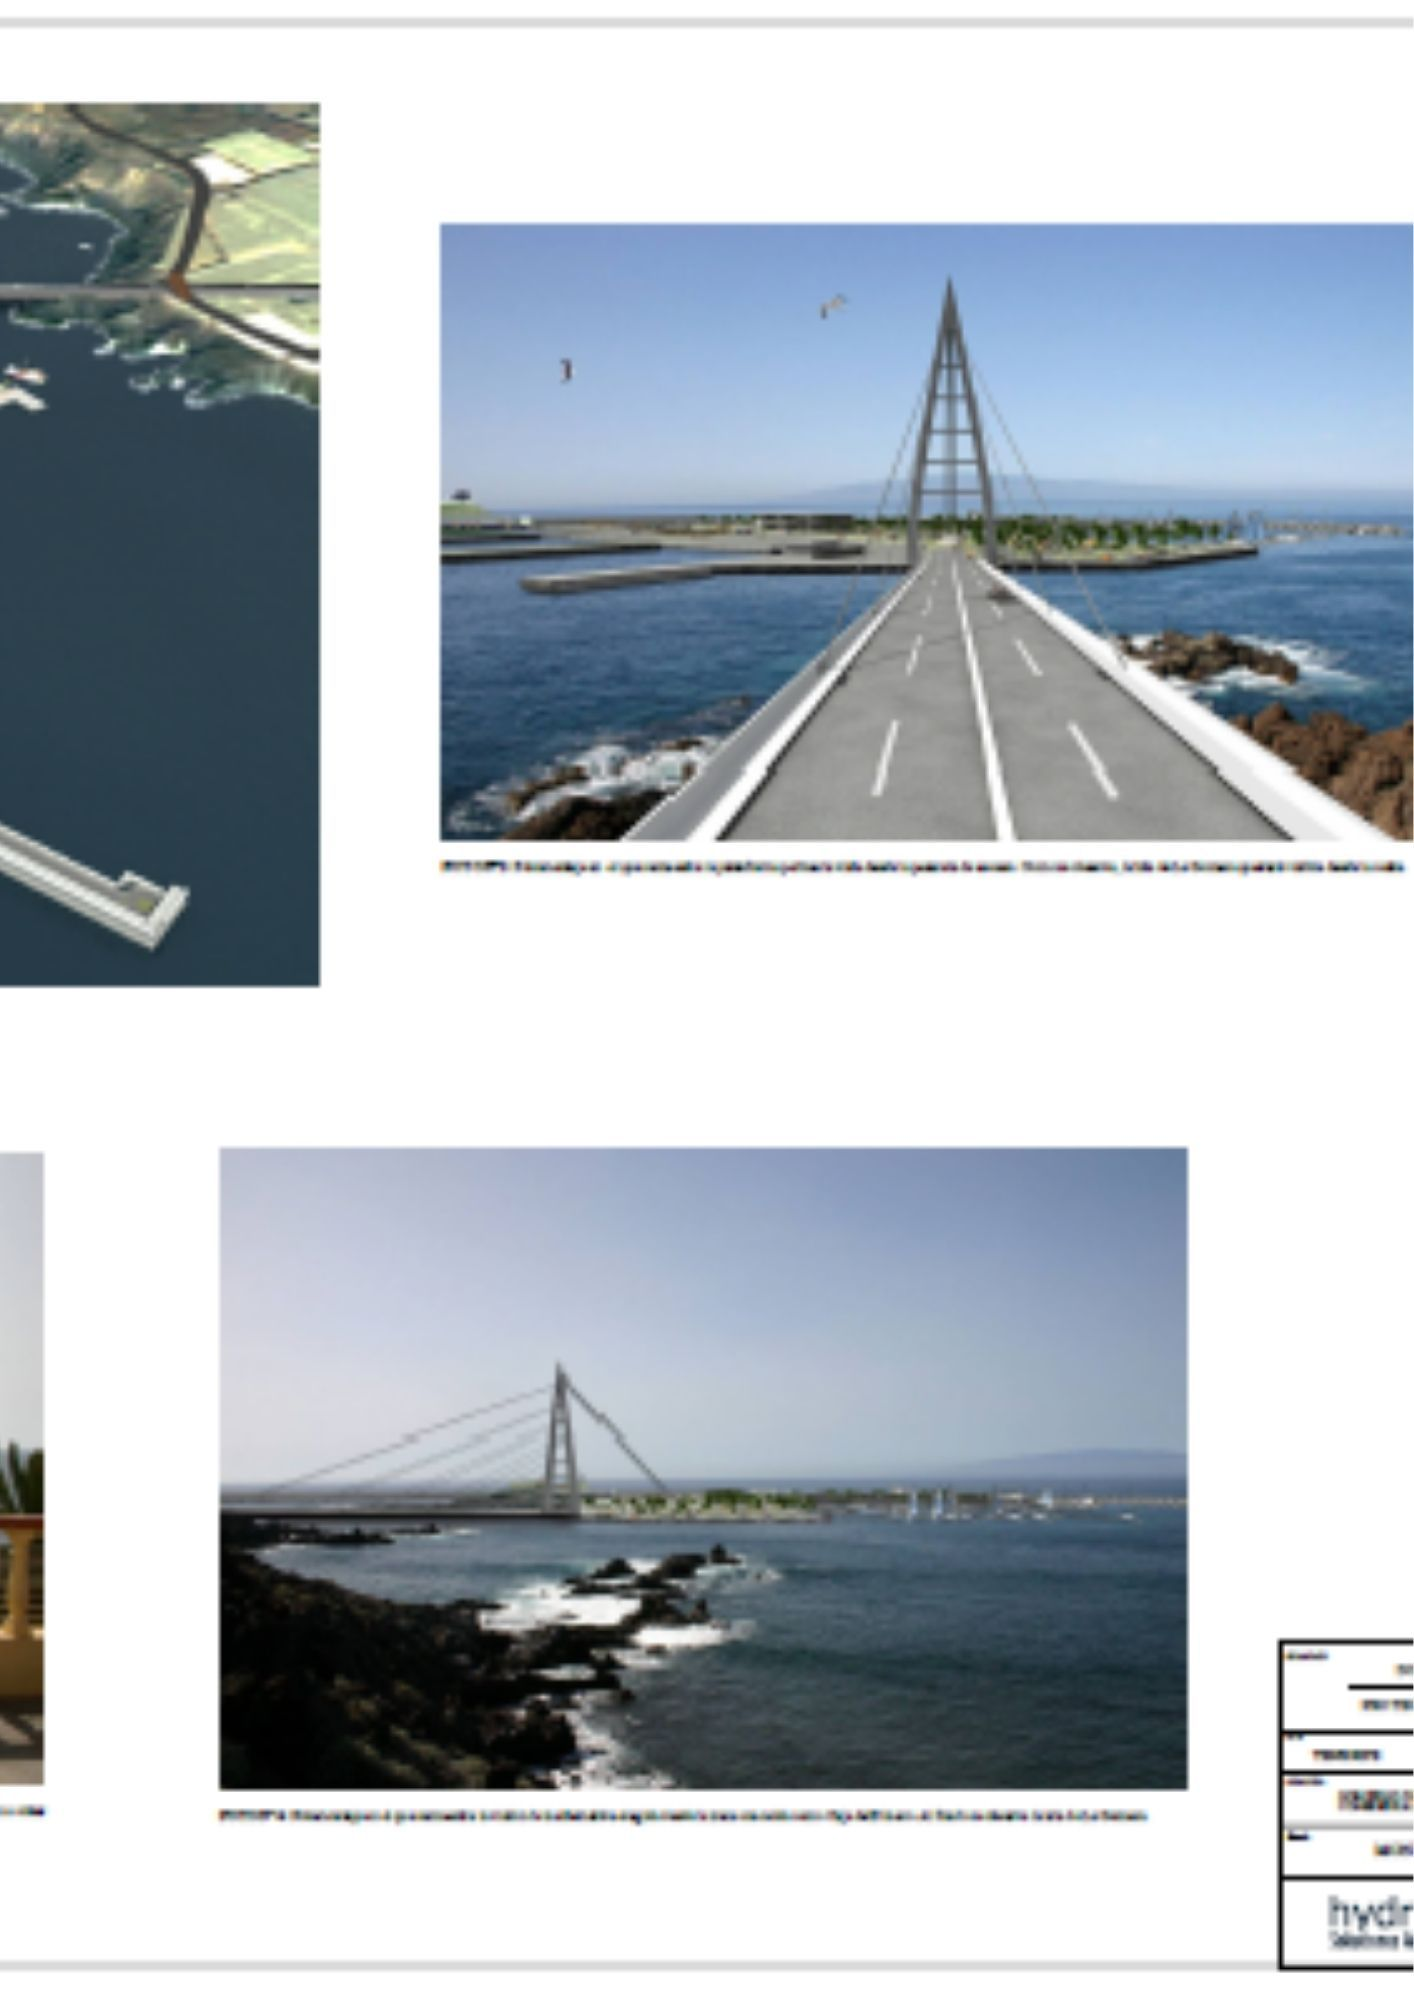 Montaje del puerto de Isora